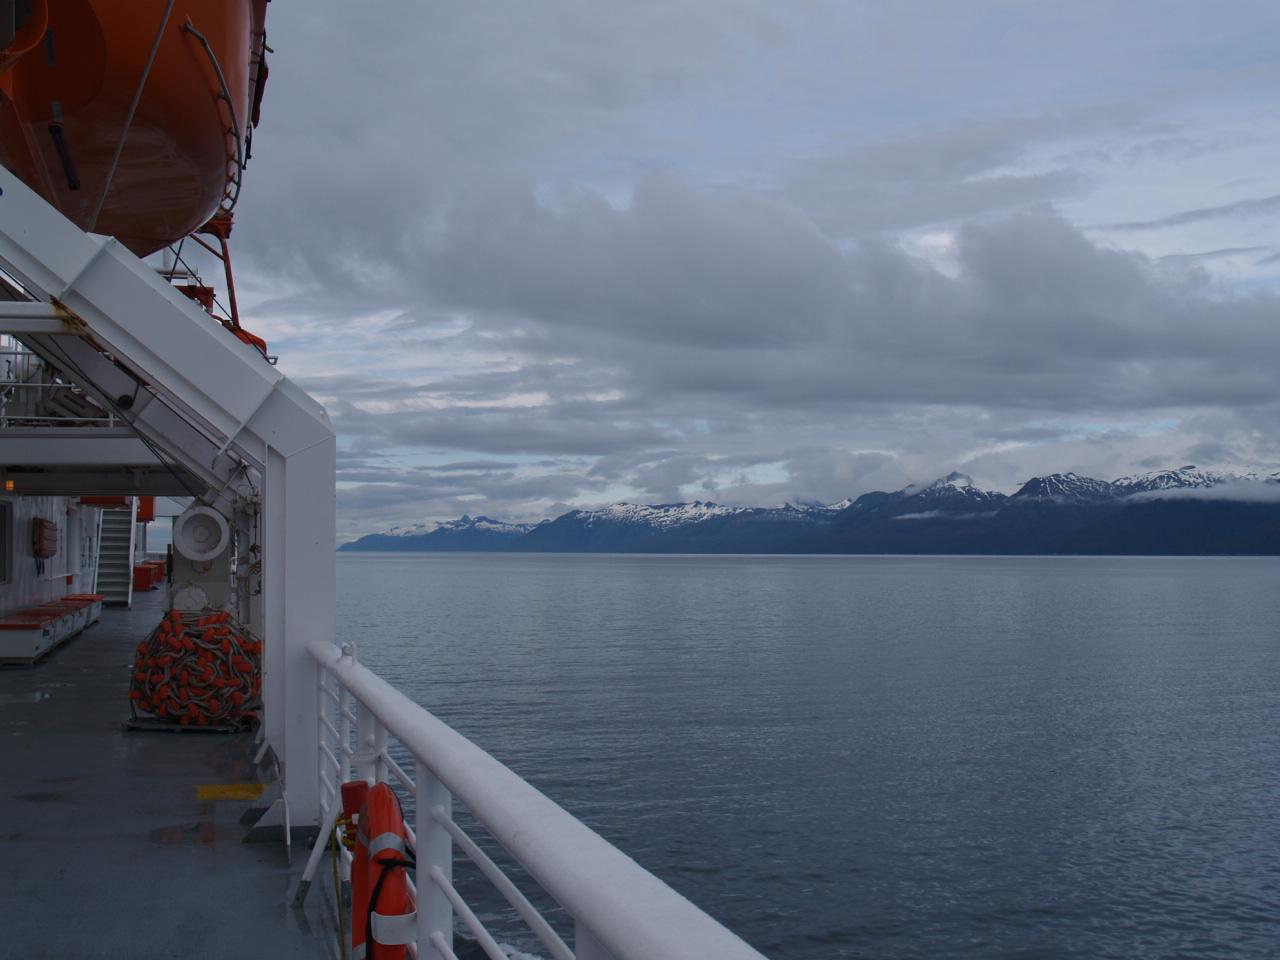 The MV Matanuska in Chatham Strait on the way to Petersburg.